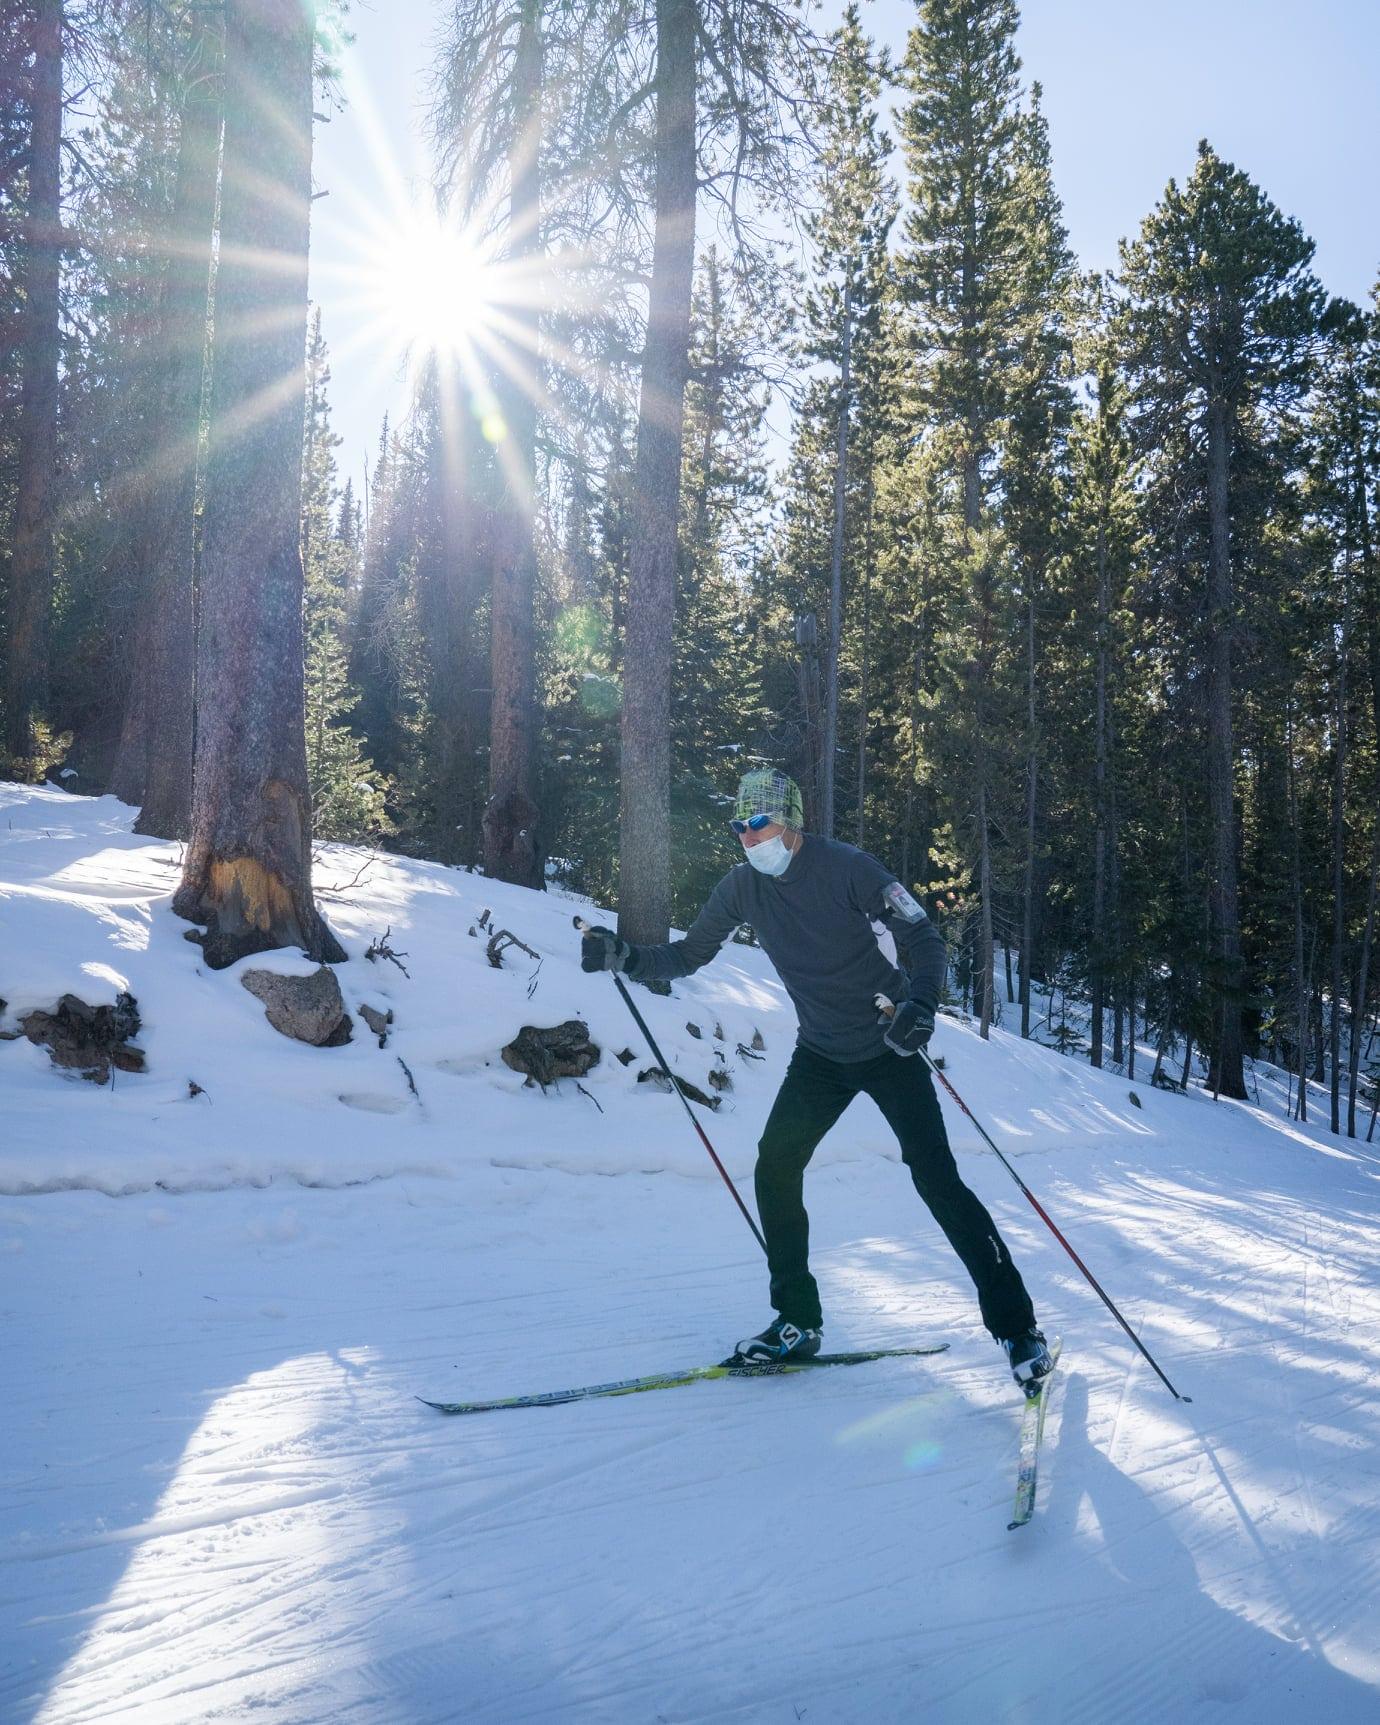 image of nordic skier